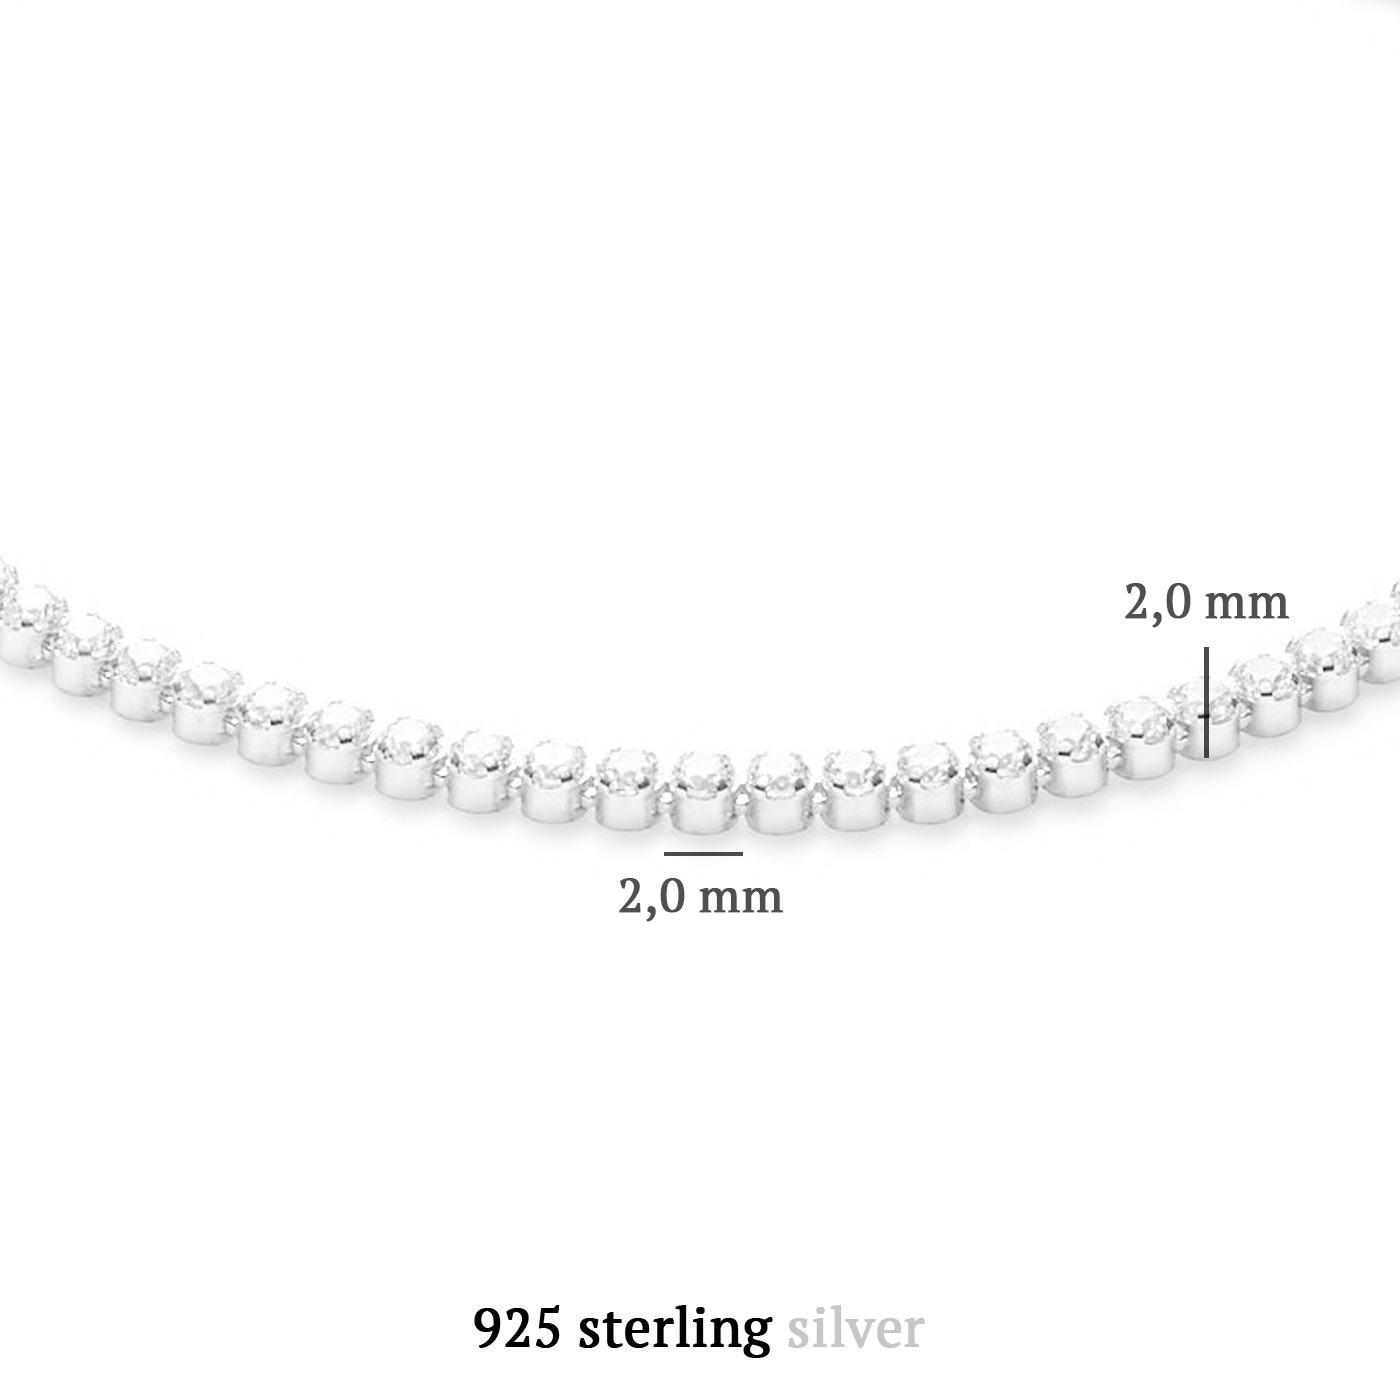 Parte di Me Ponte Vecchio Pitti 925 sterling zilveren armband met zirkonia